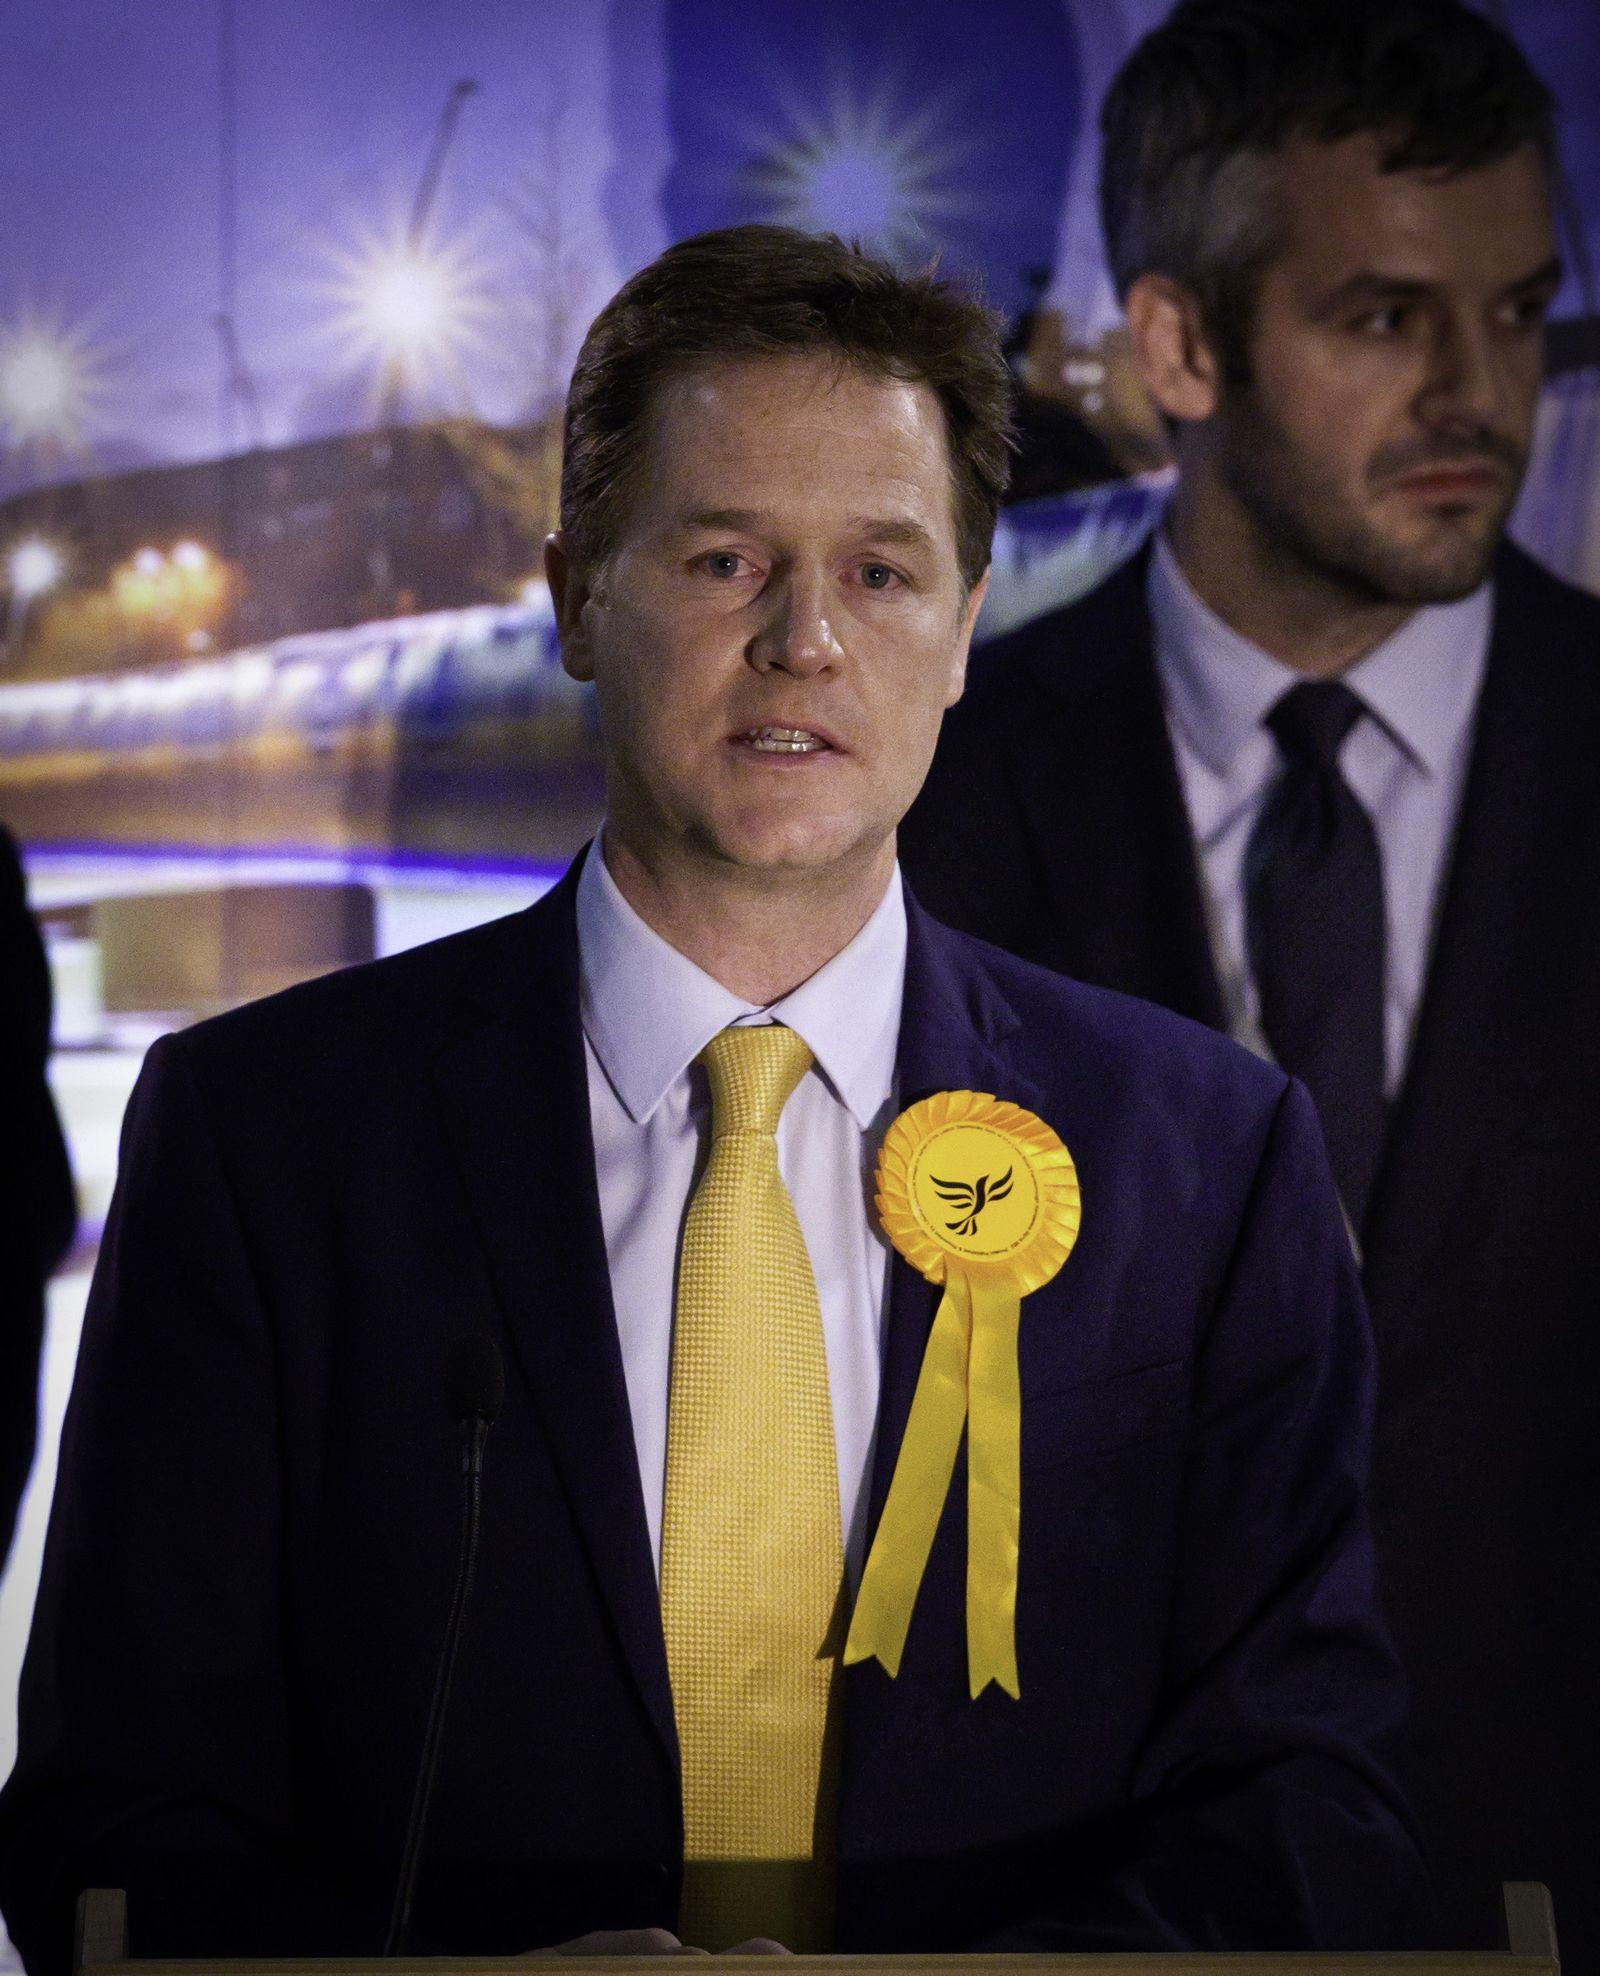 Großbritannien Wahl Nick Clegg